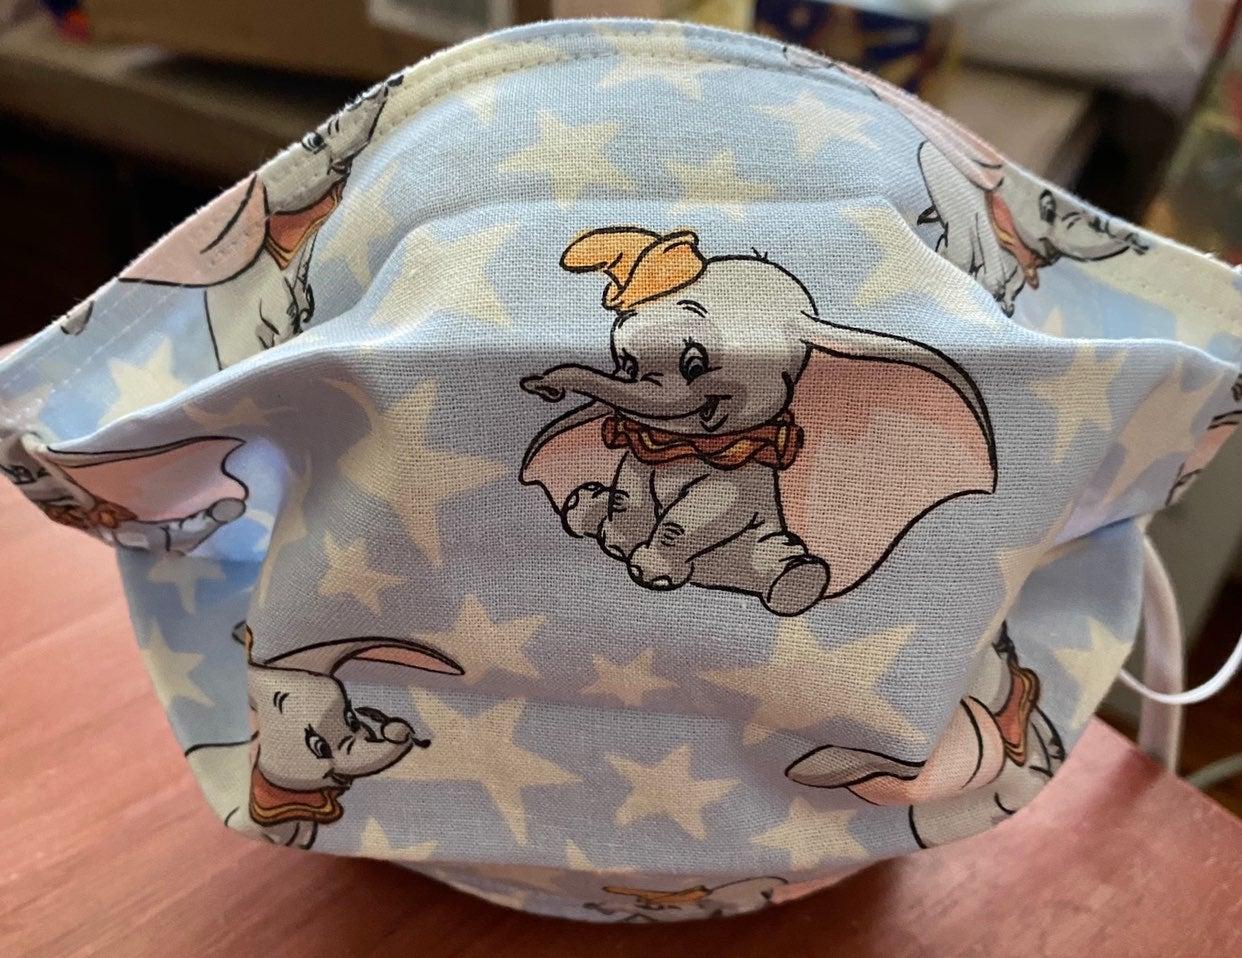 Disney dumbo mask